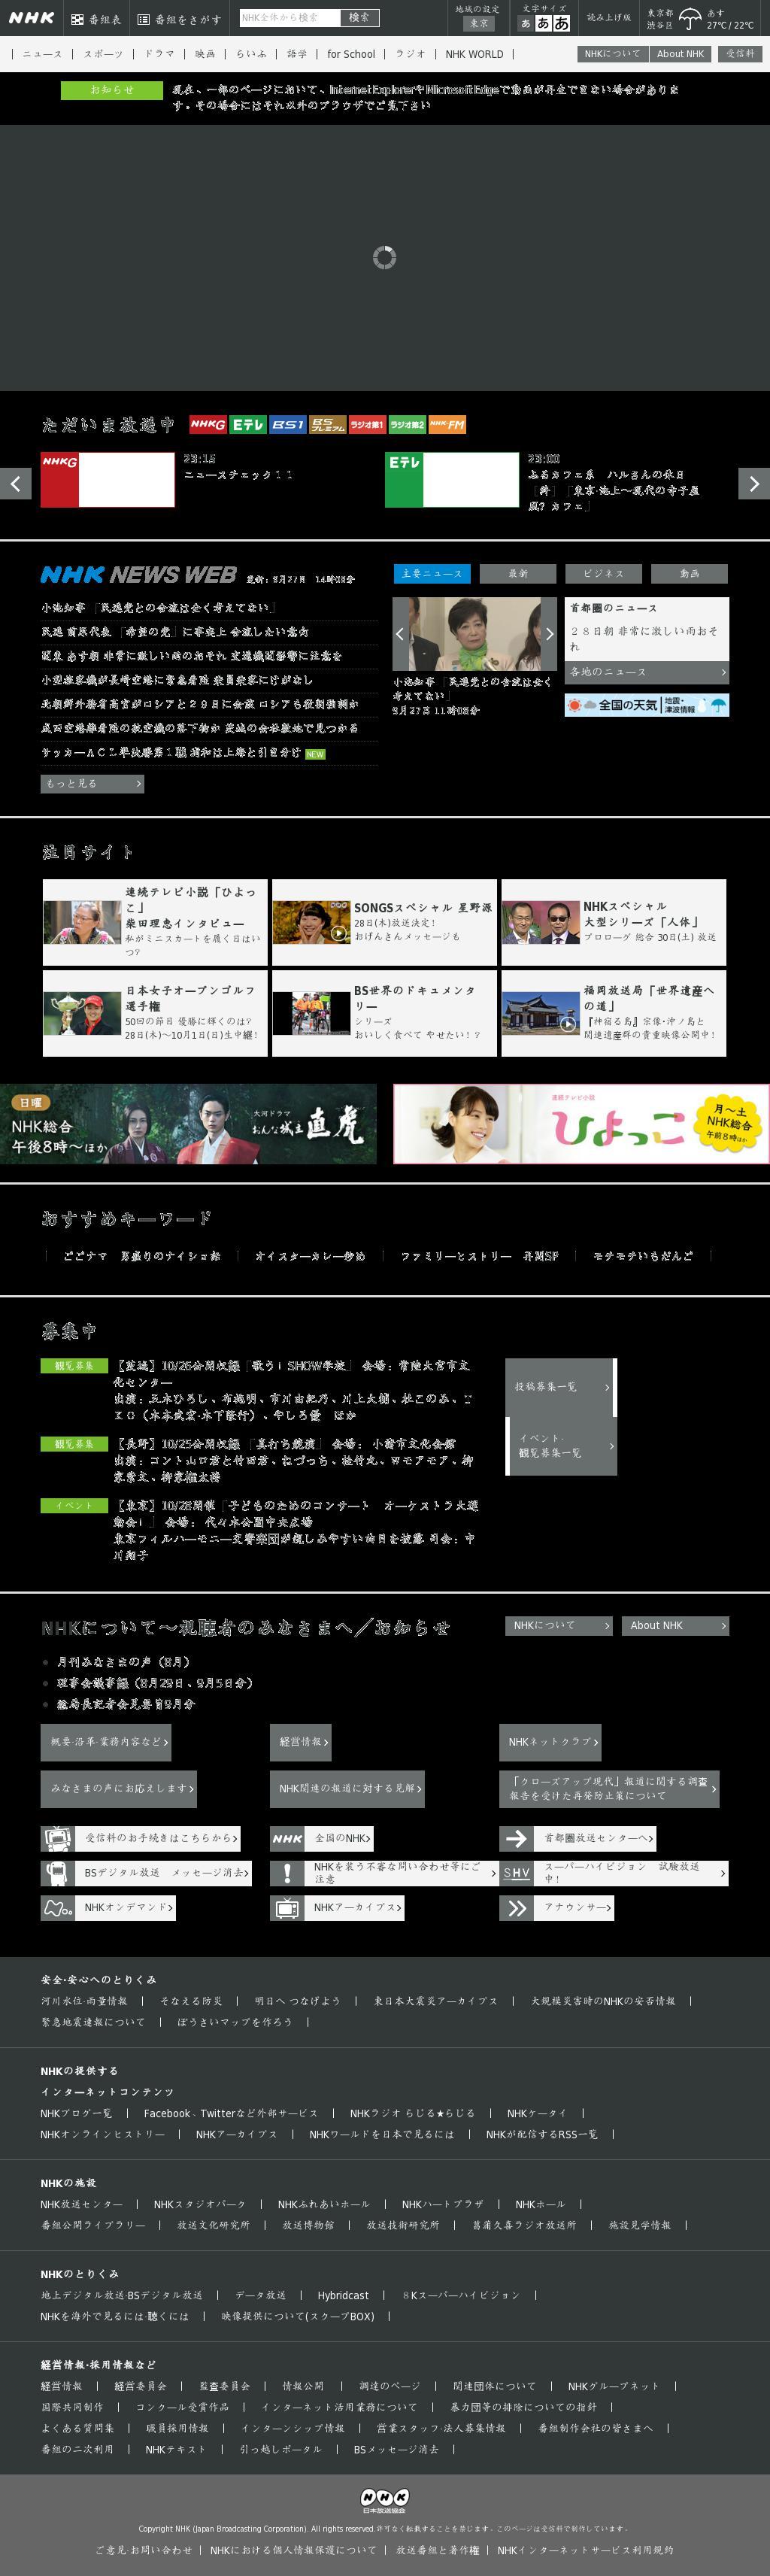 NHK Online at Wednesday Sept. 27, 2017, 2:23 p.m. UTC